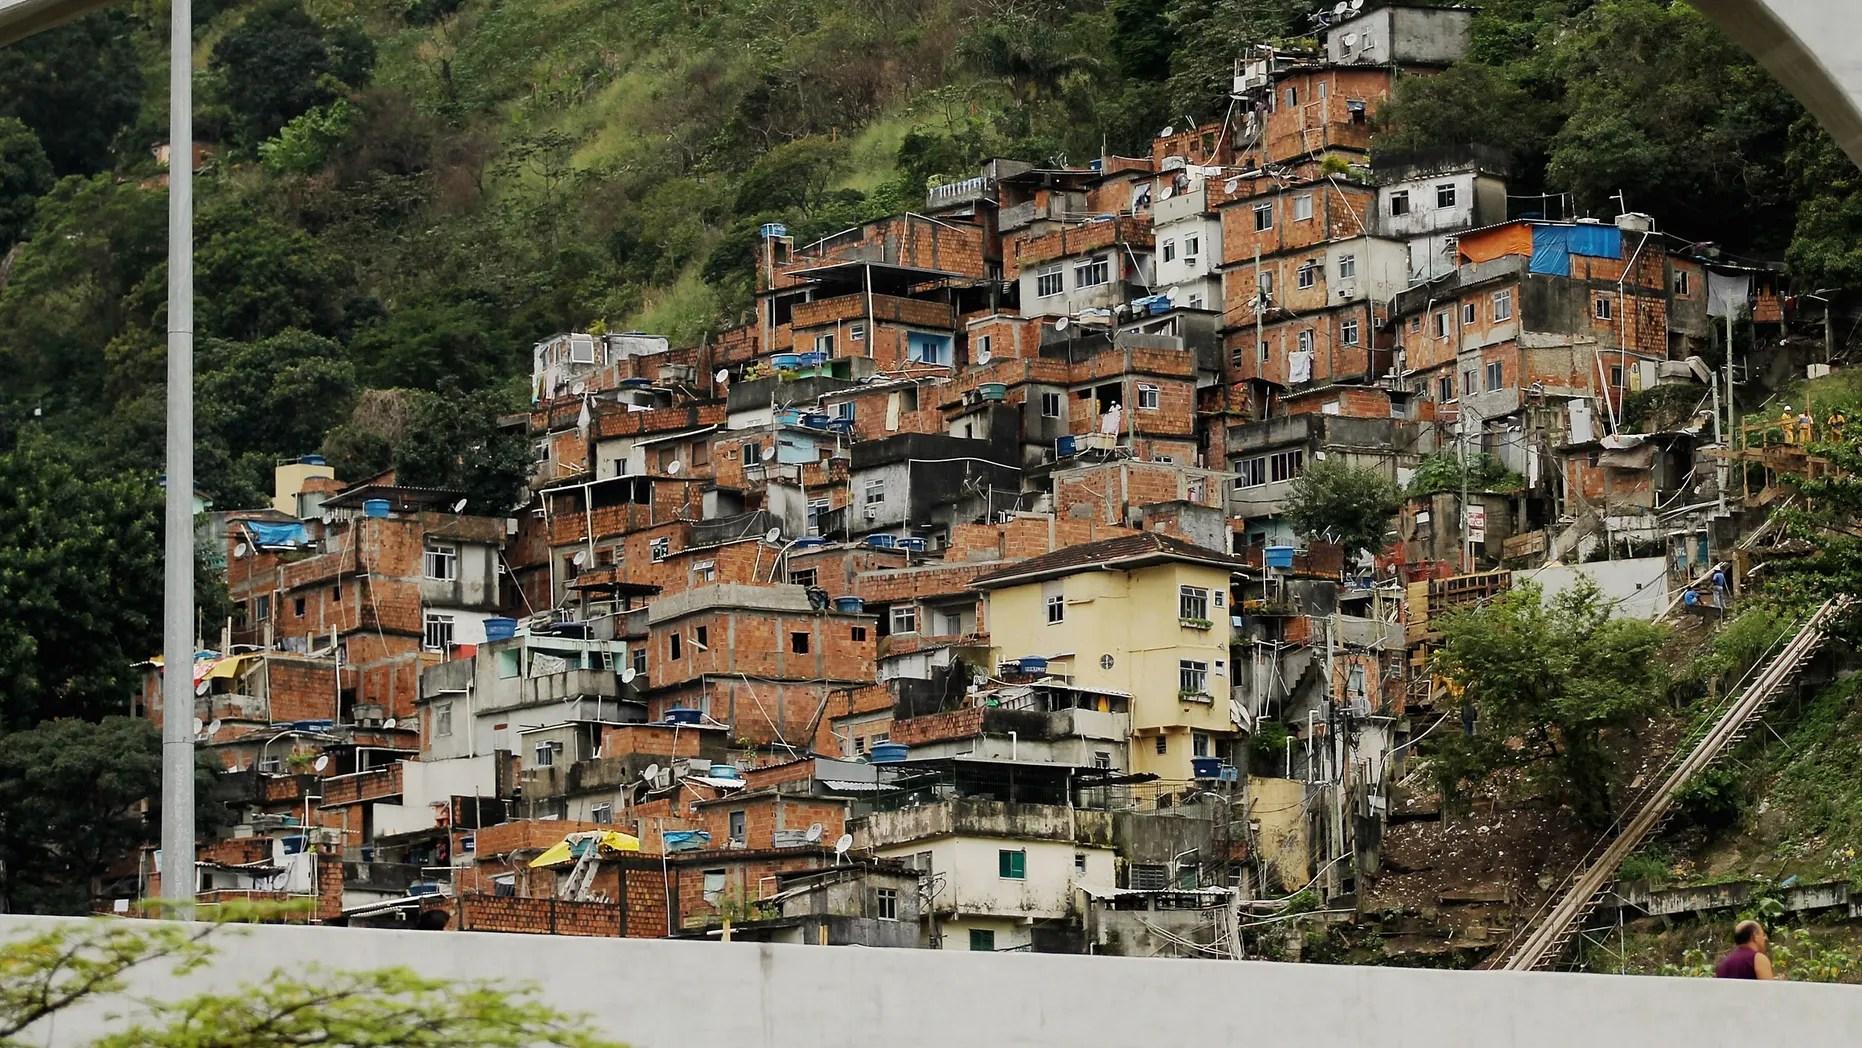 Rio de Janieros quotFavelasquot Transform from Slums to Real